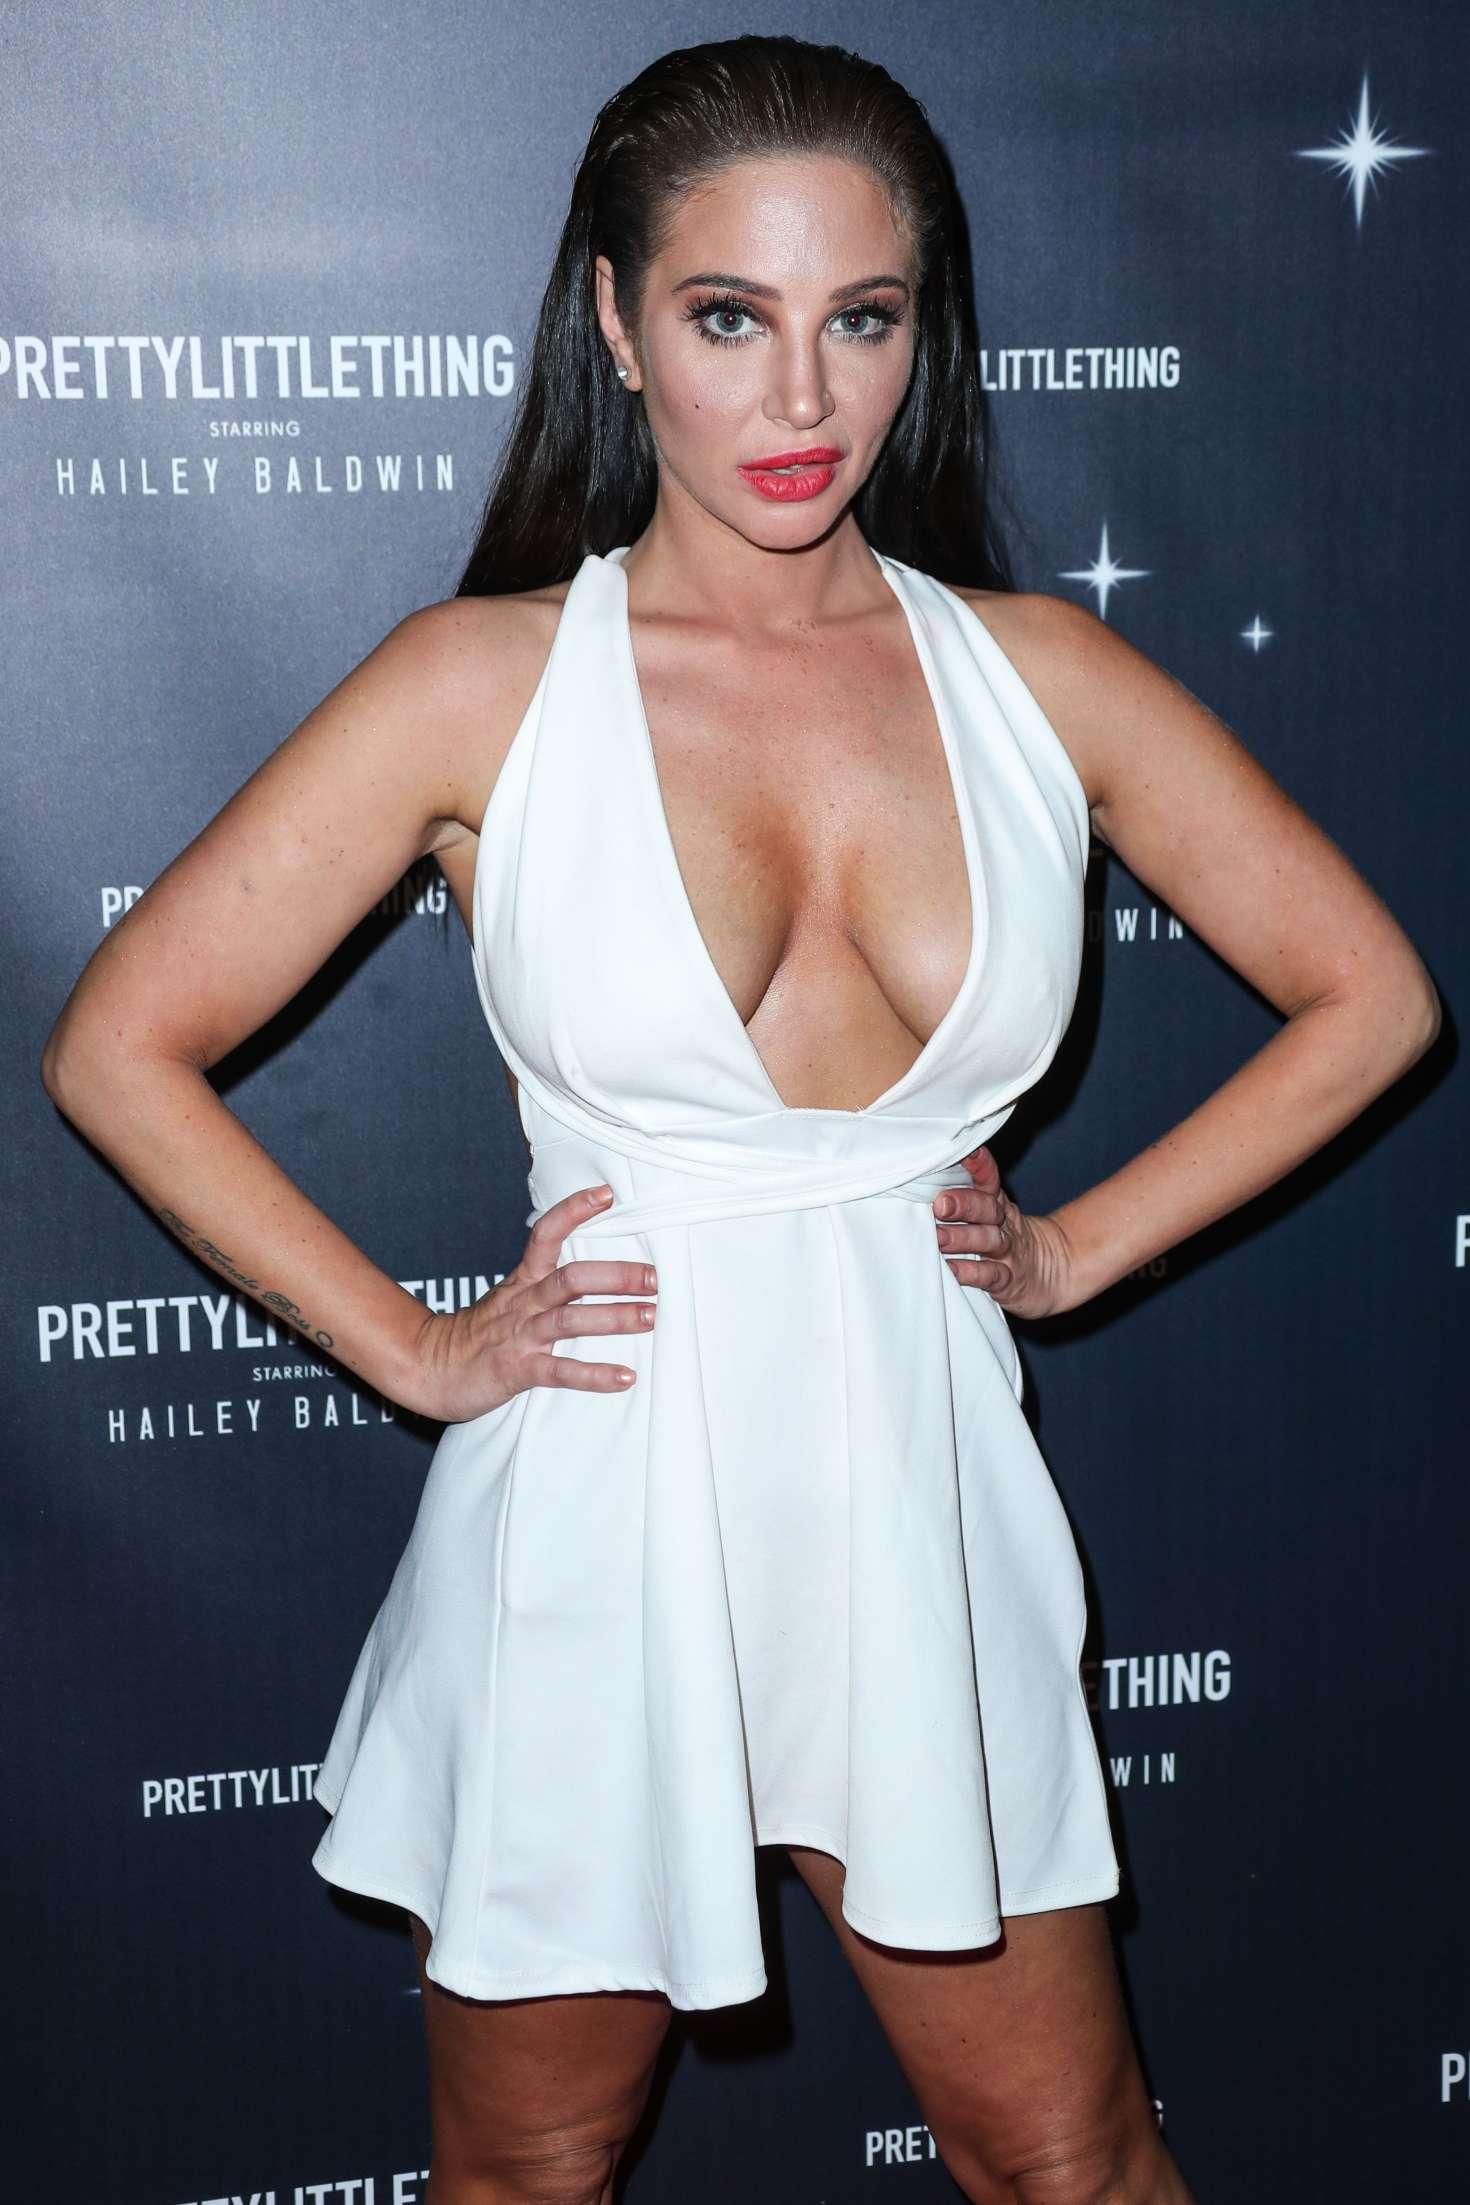 Tulisa Contostavlos - PrettyLittleThing x Hailey Baldwin Launch Event in LA